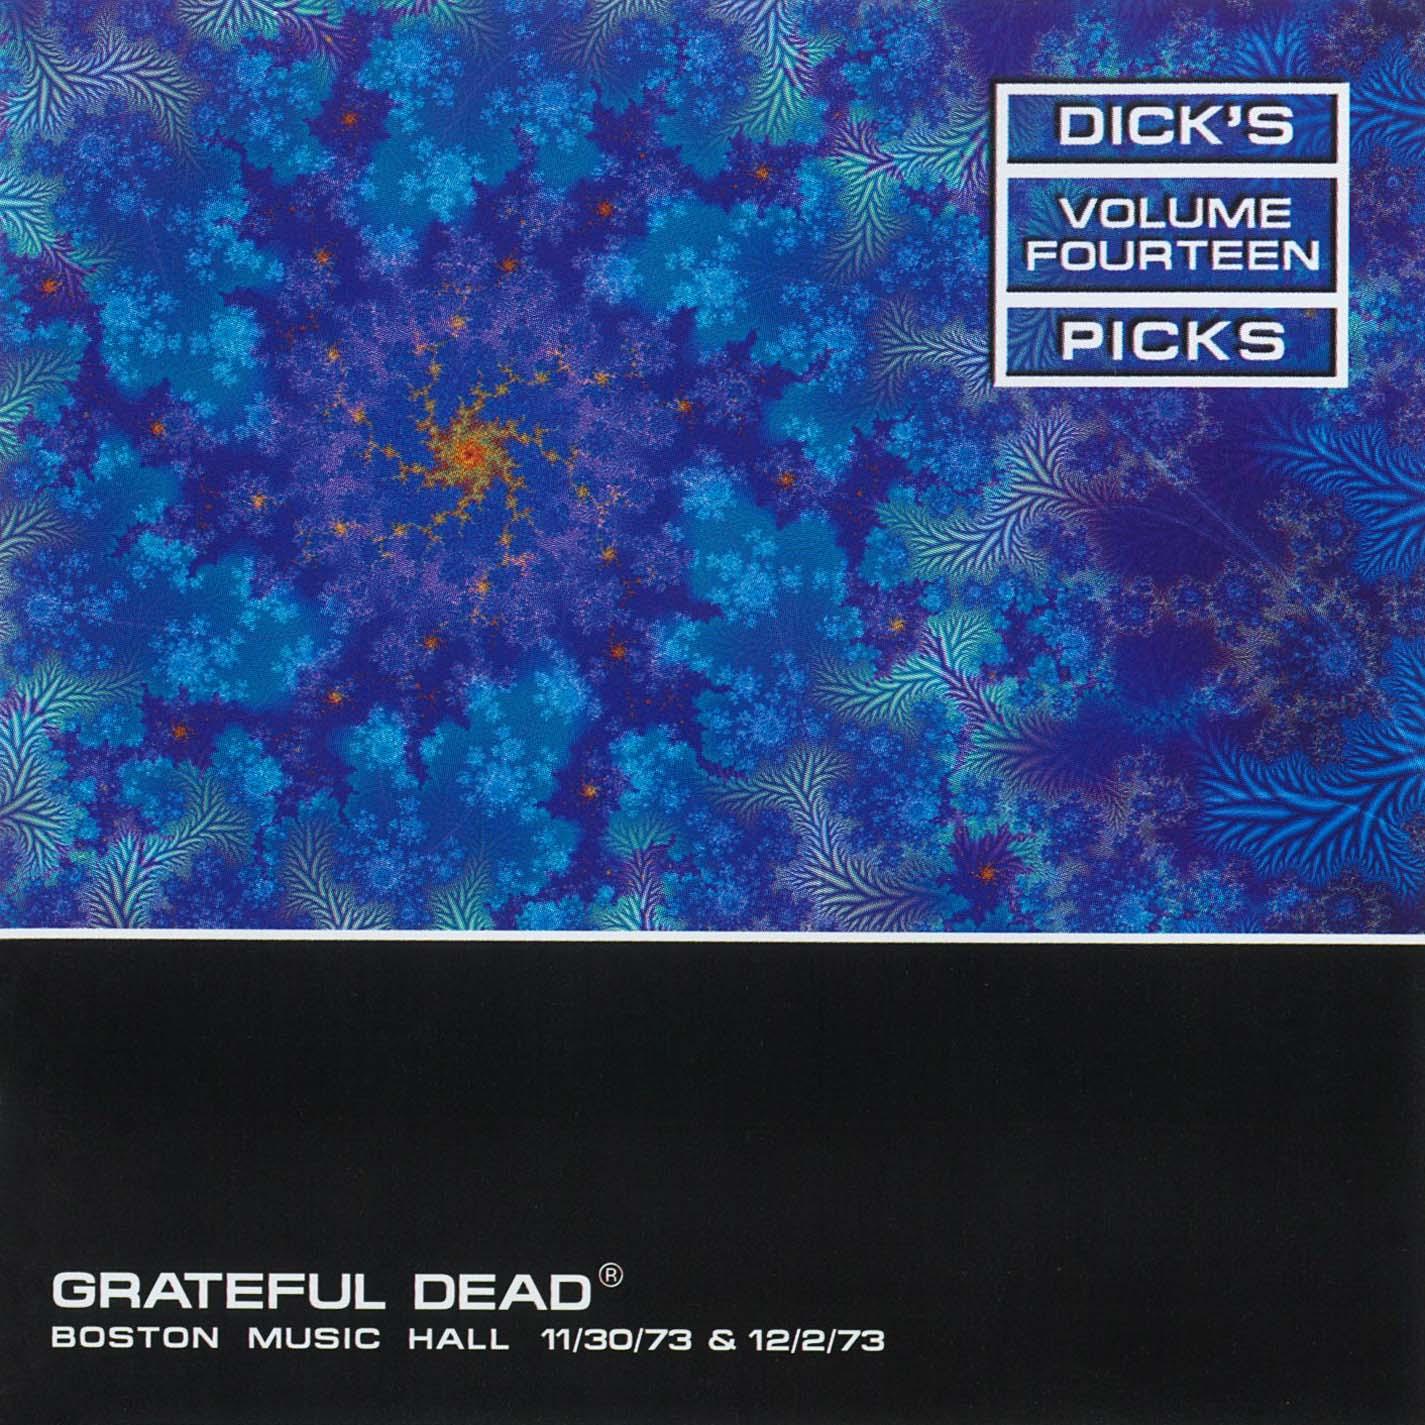 Grateful Dead Dick's Picks 14 album cover artwork